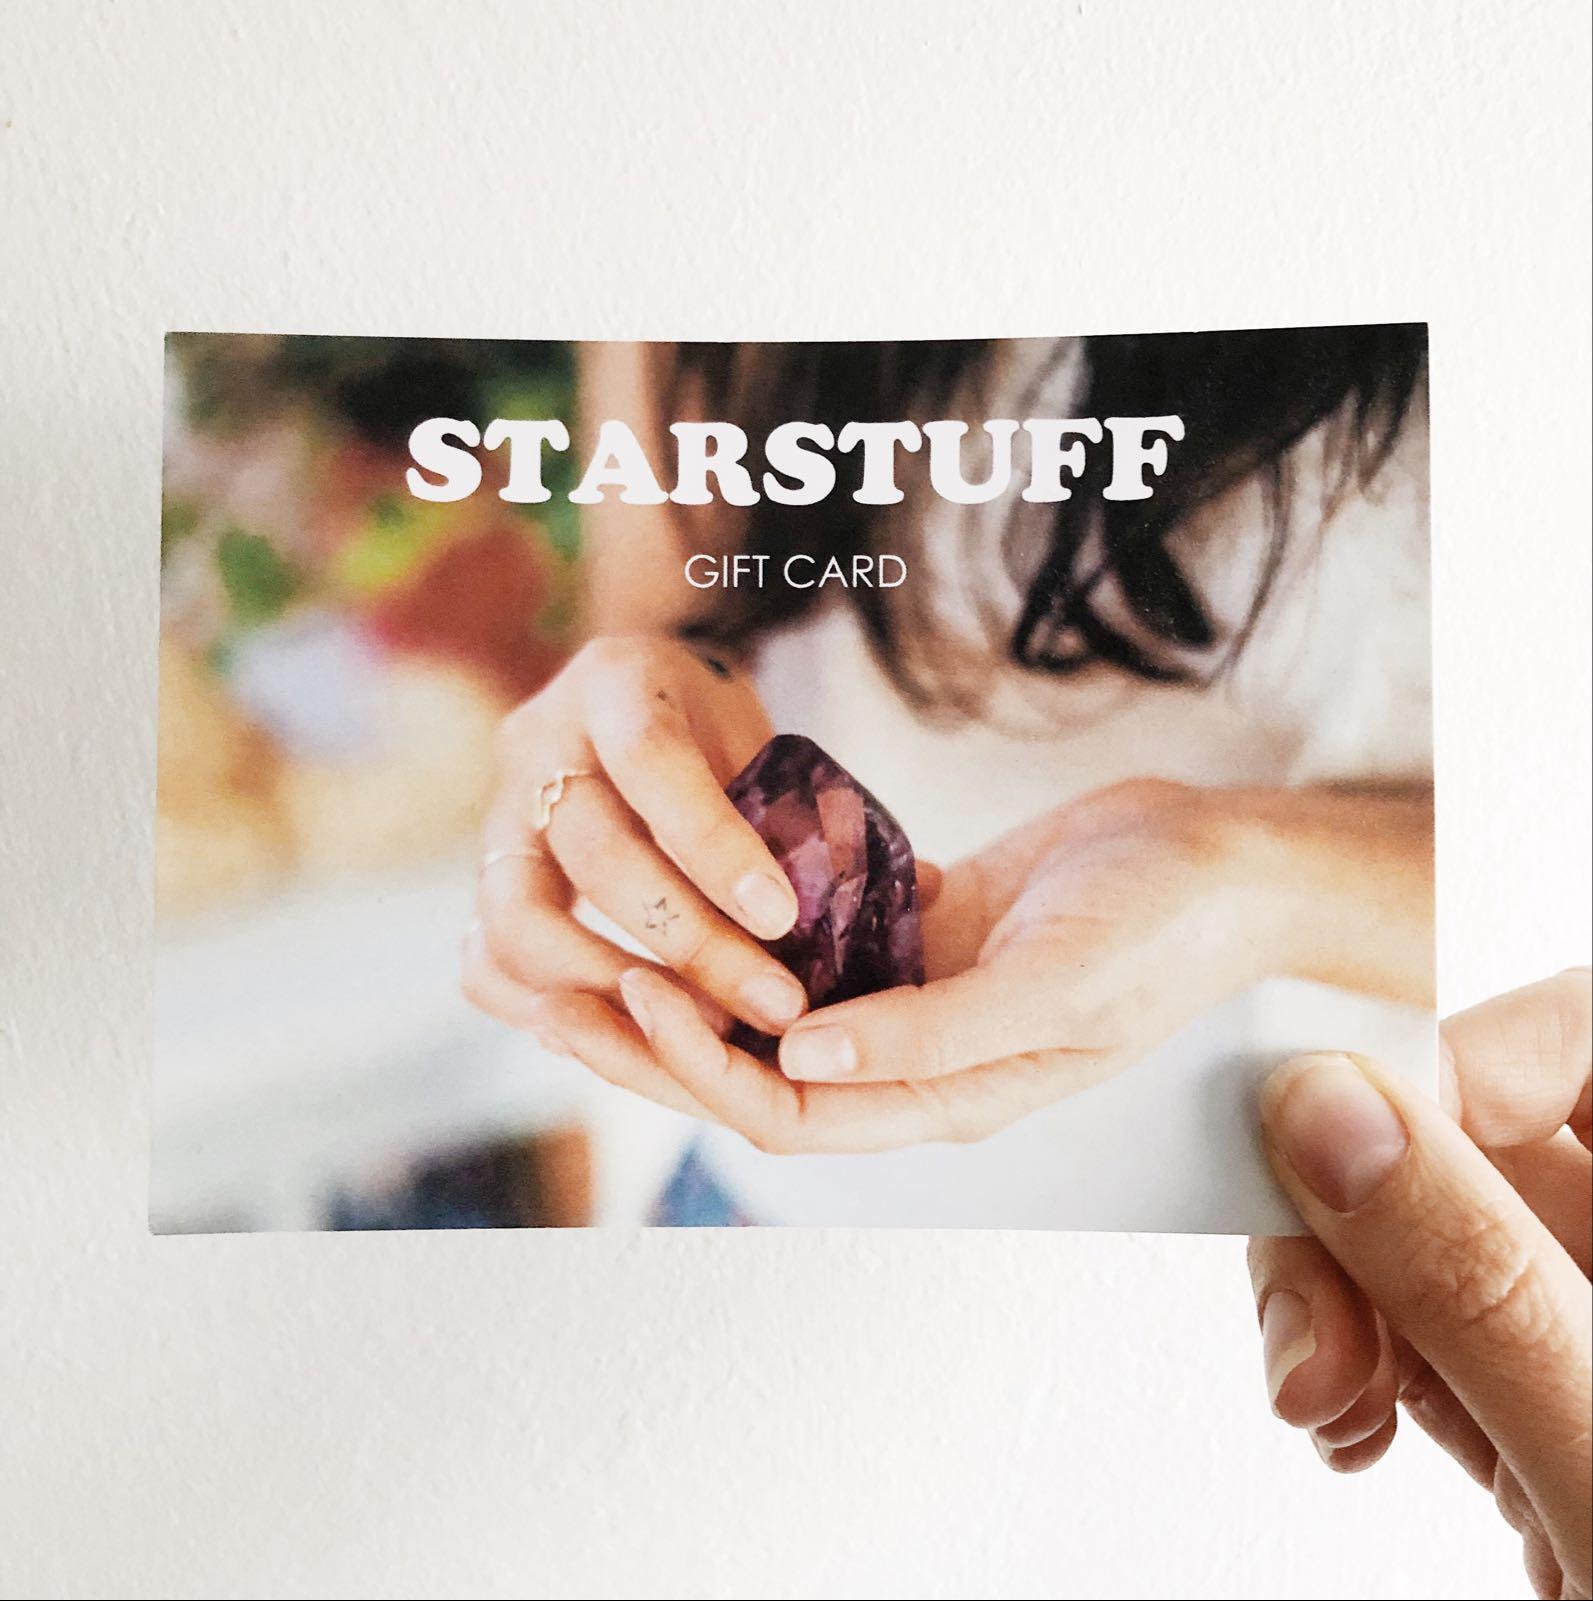 Starstuff Gift Card